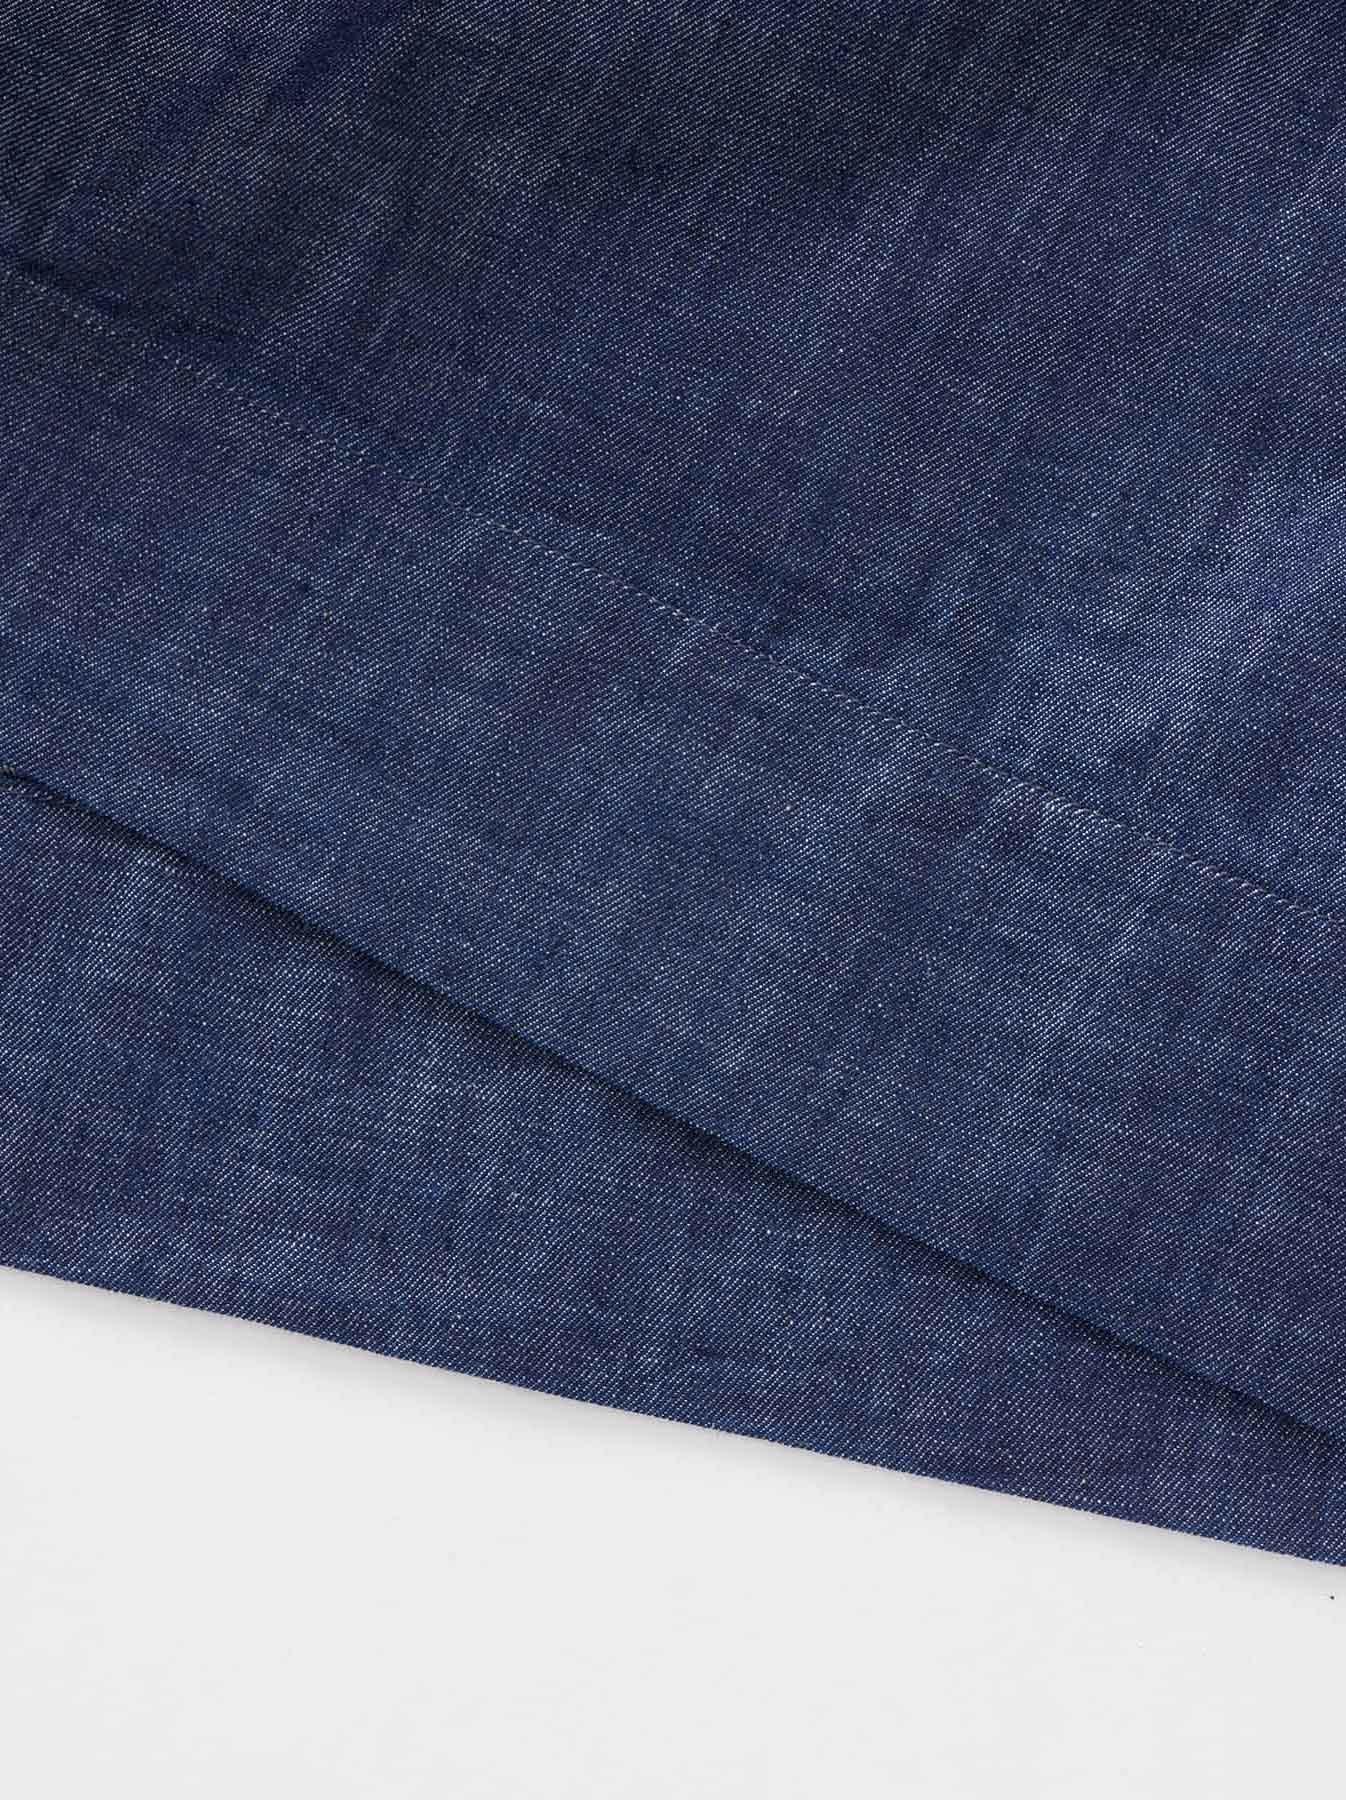 WH Goma Denim Umahiko Pullover Shirt-10